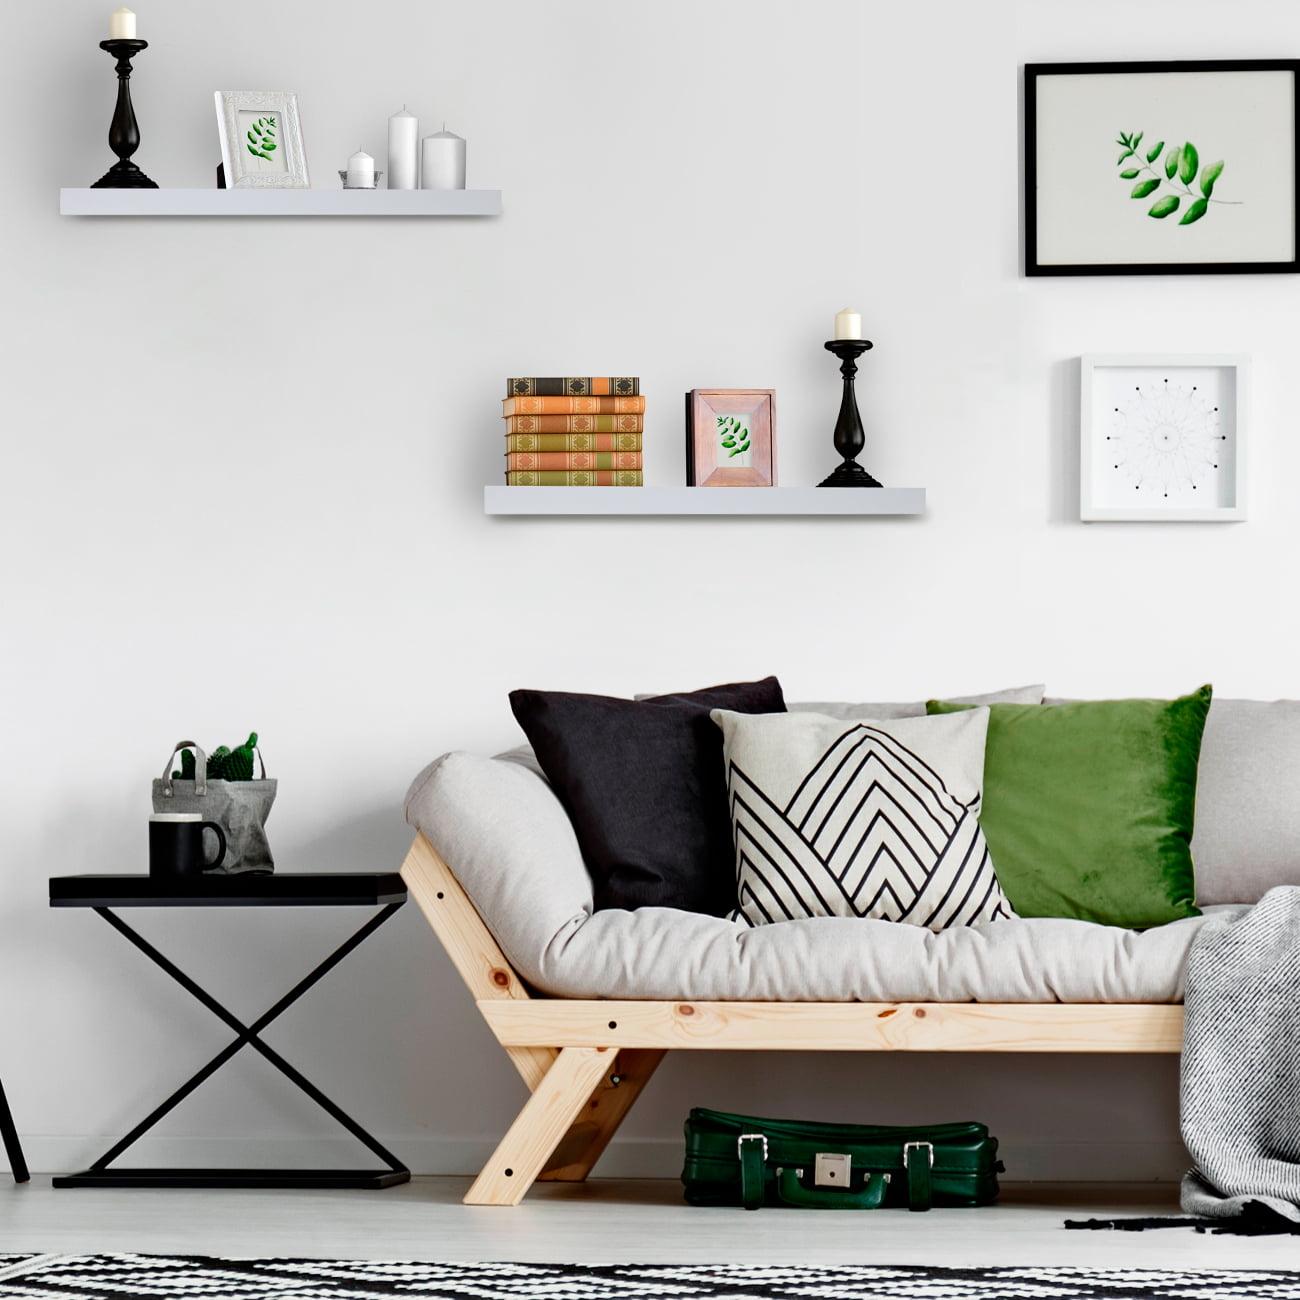 Rectangle Shelf Set - Blue Sorbus Floating Shelf /— Hanging Wall Shelves Decoration /— Perfect Trophy Display Photo Frames /— Extra Long 24 Inch